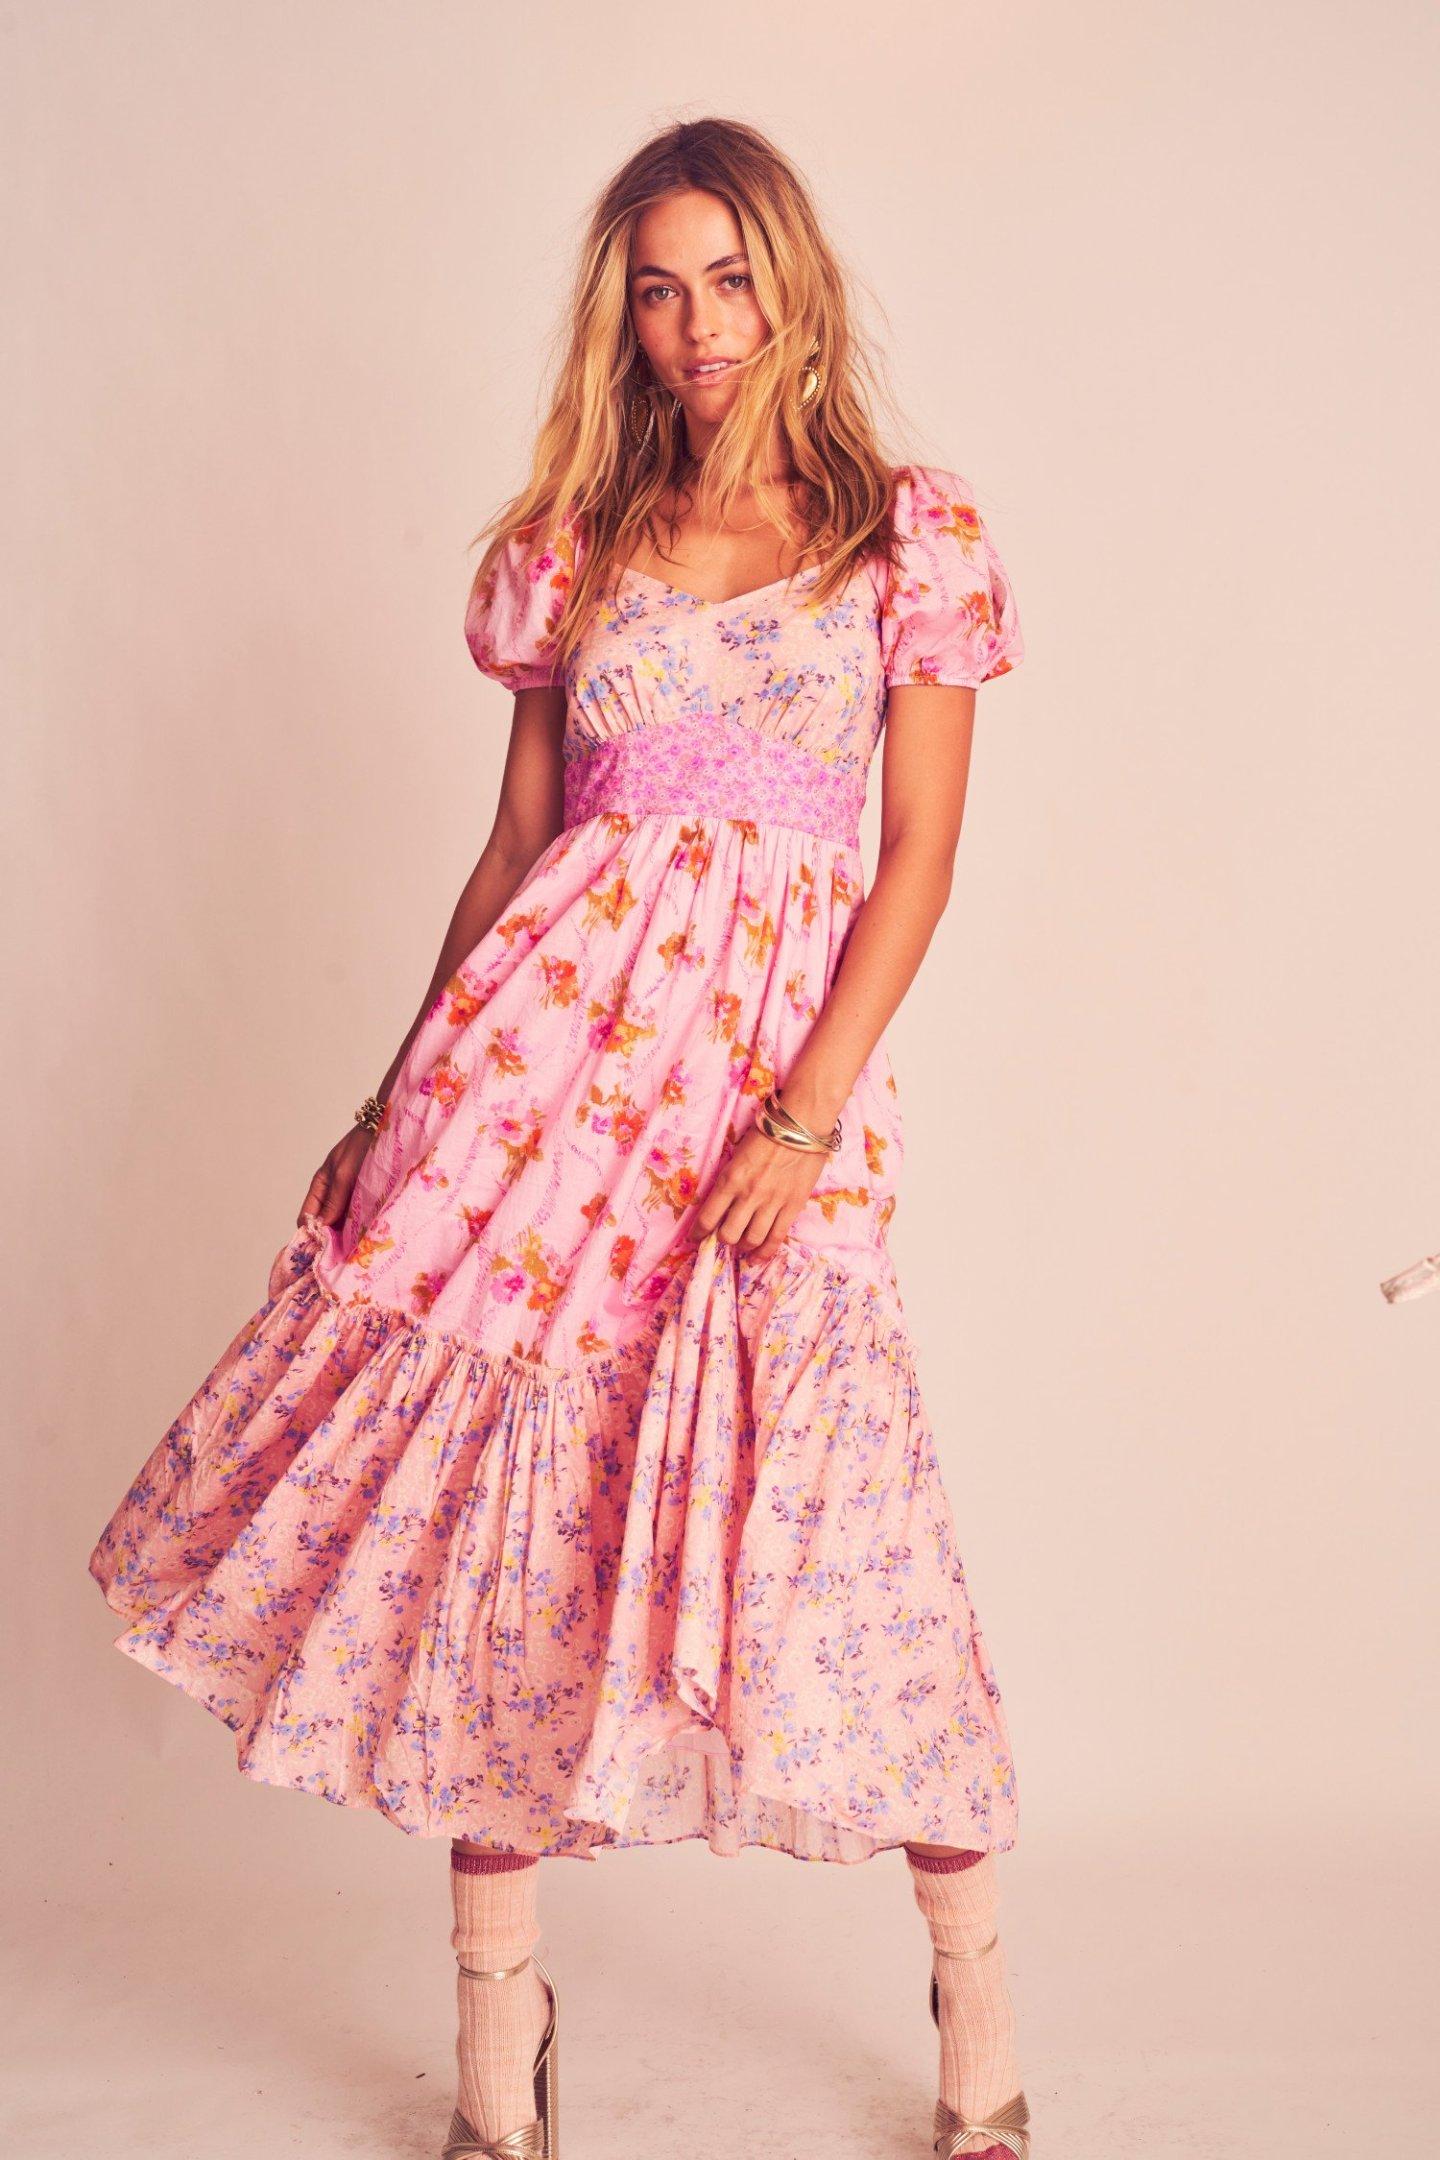 Pink Cottagecore Aesthetic Dress